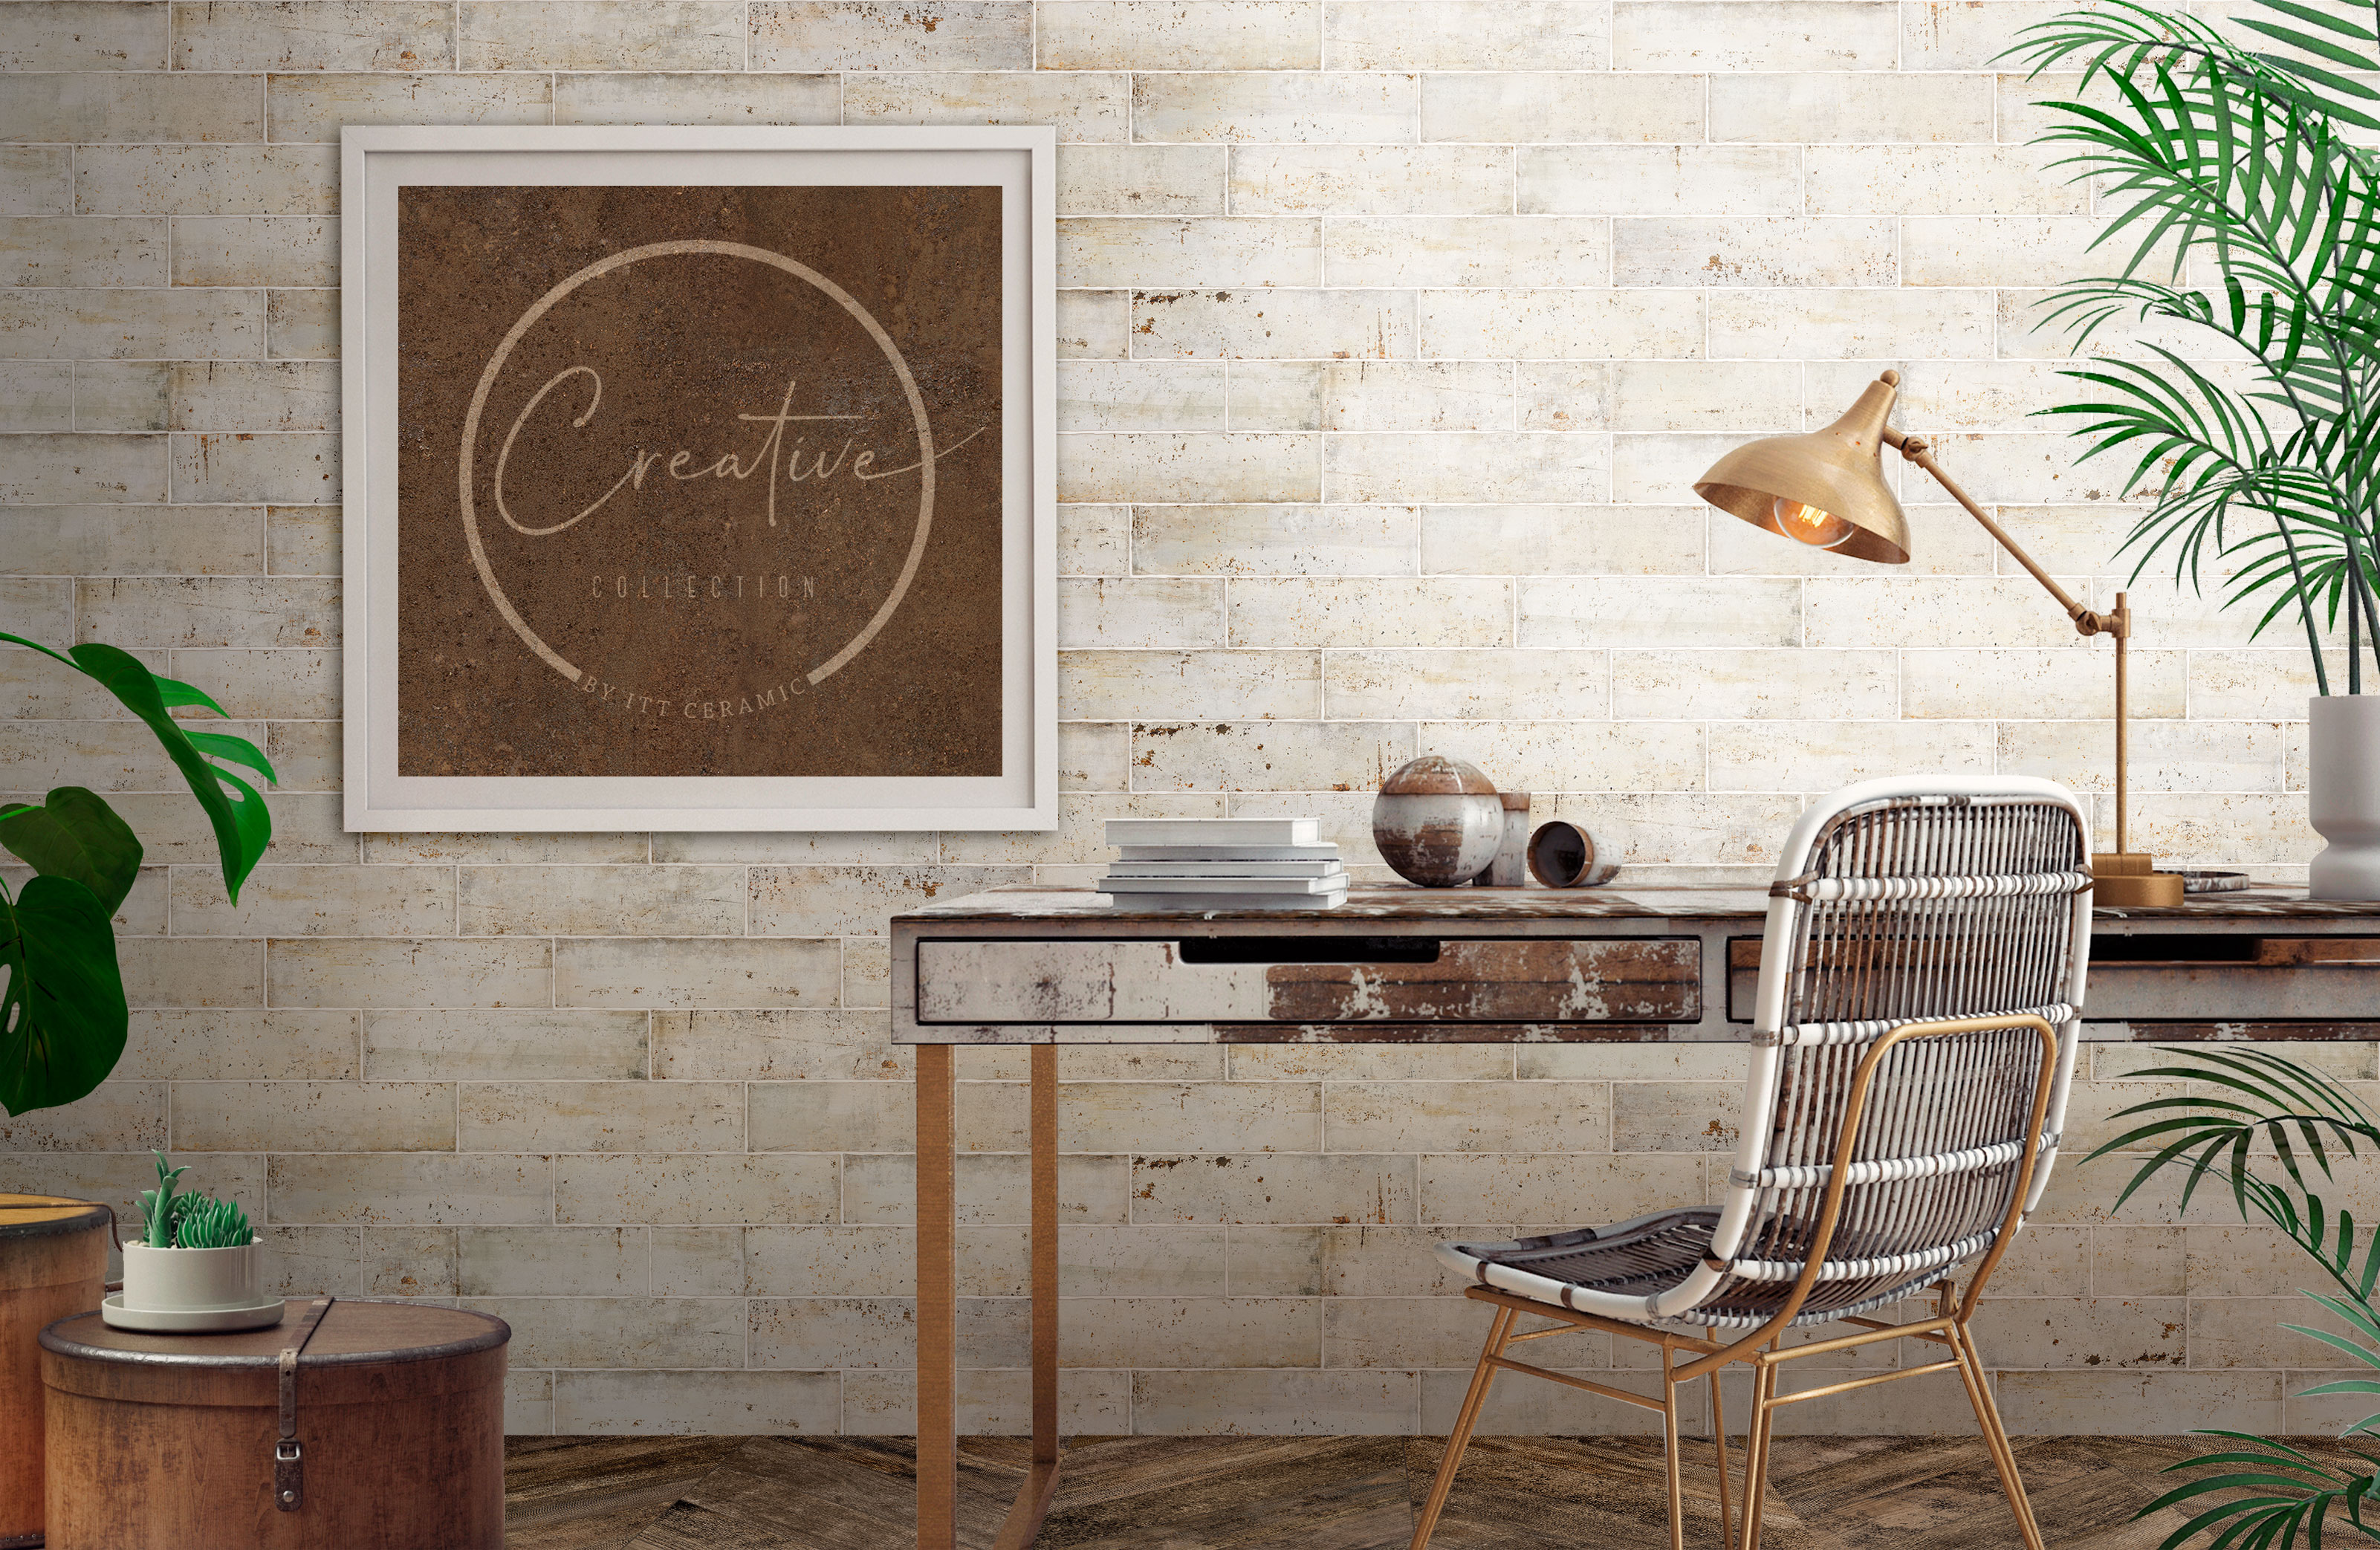 Creative by ITT Ceramic Coverings 2019